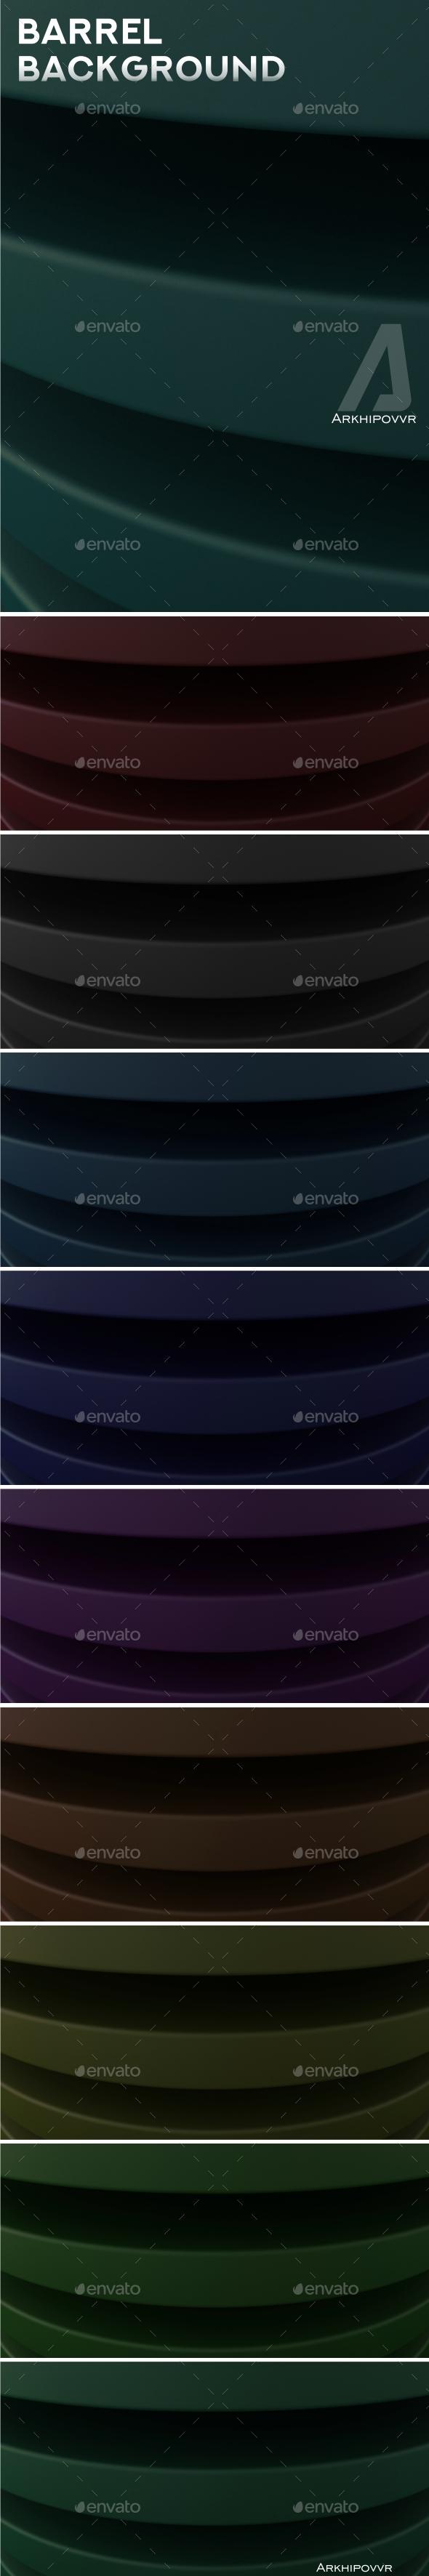 Barrel Backgrounds - Backgrounds Graphics